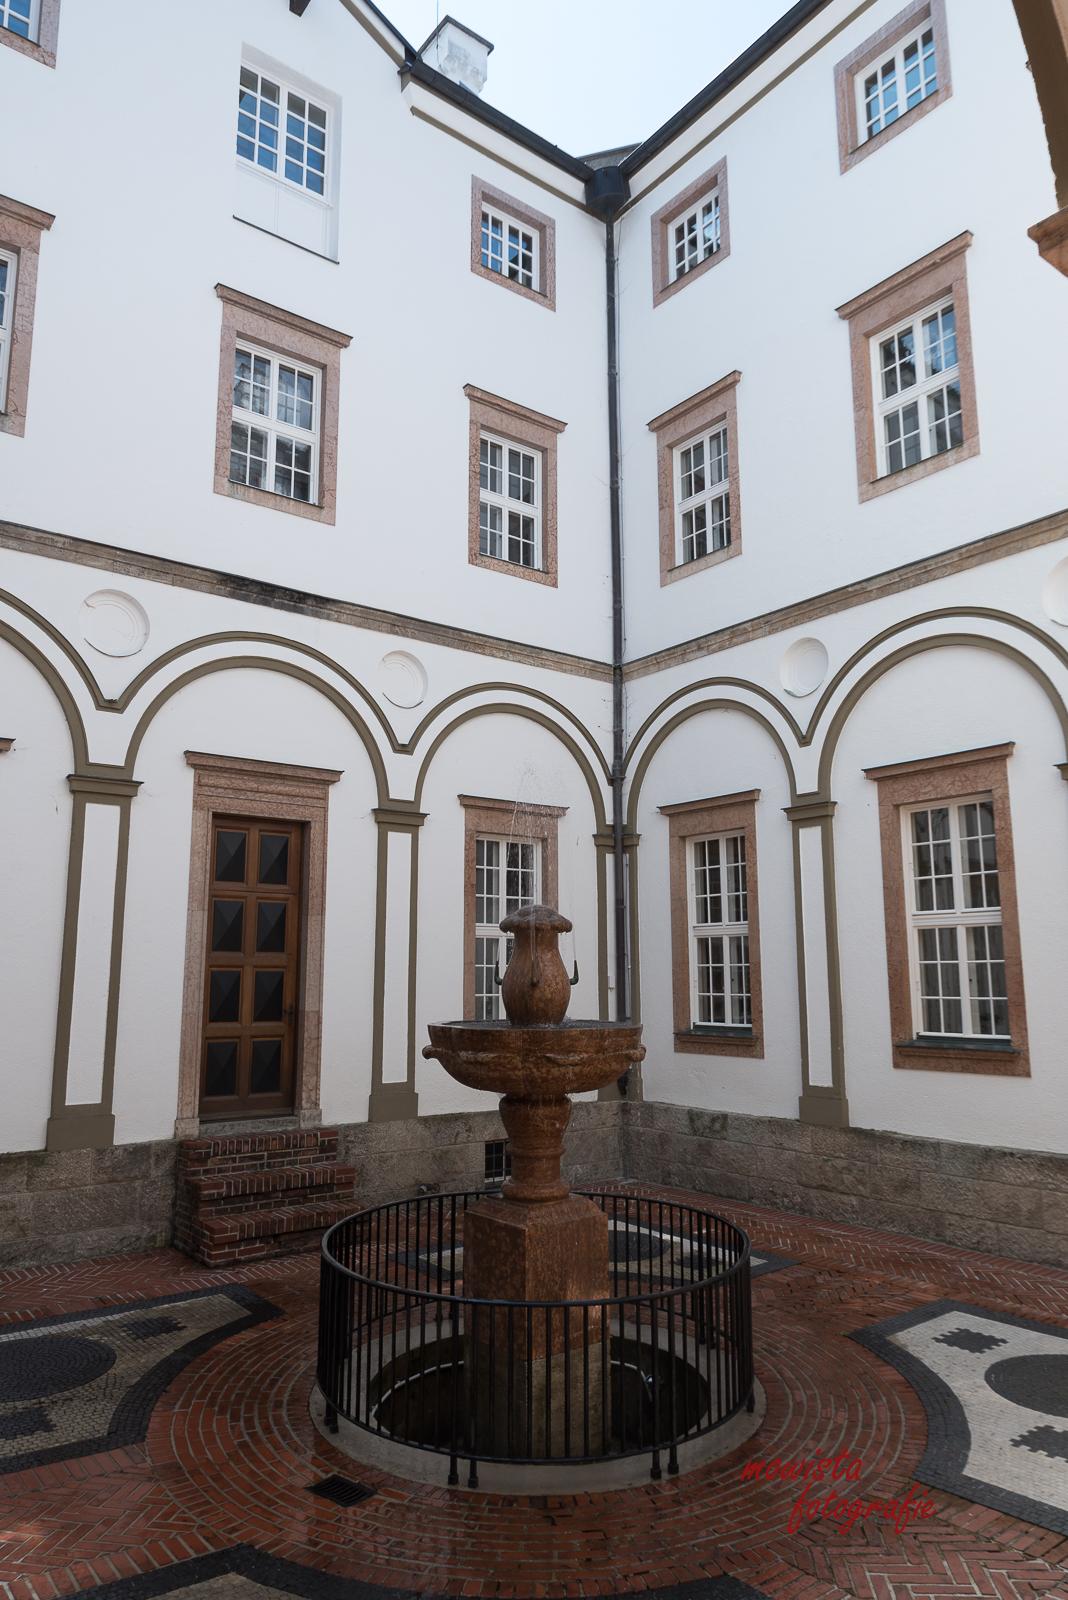 20170722_MW_DSC_5766_Schloss Ringberg